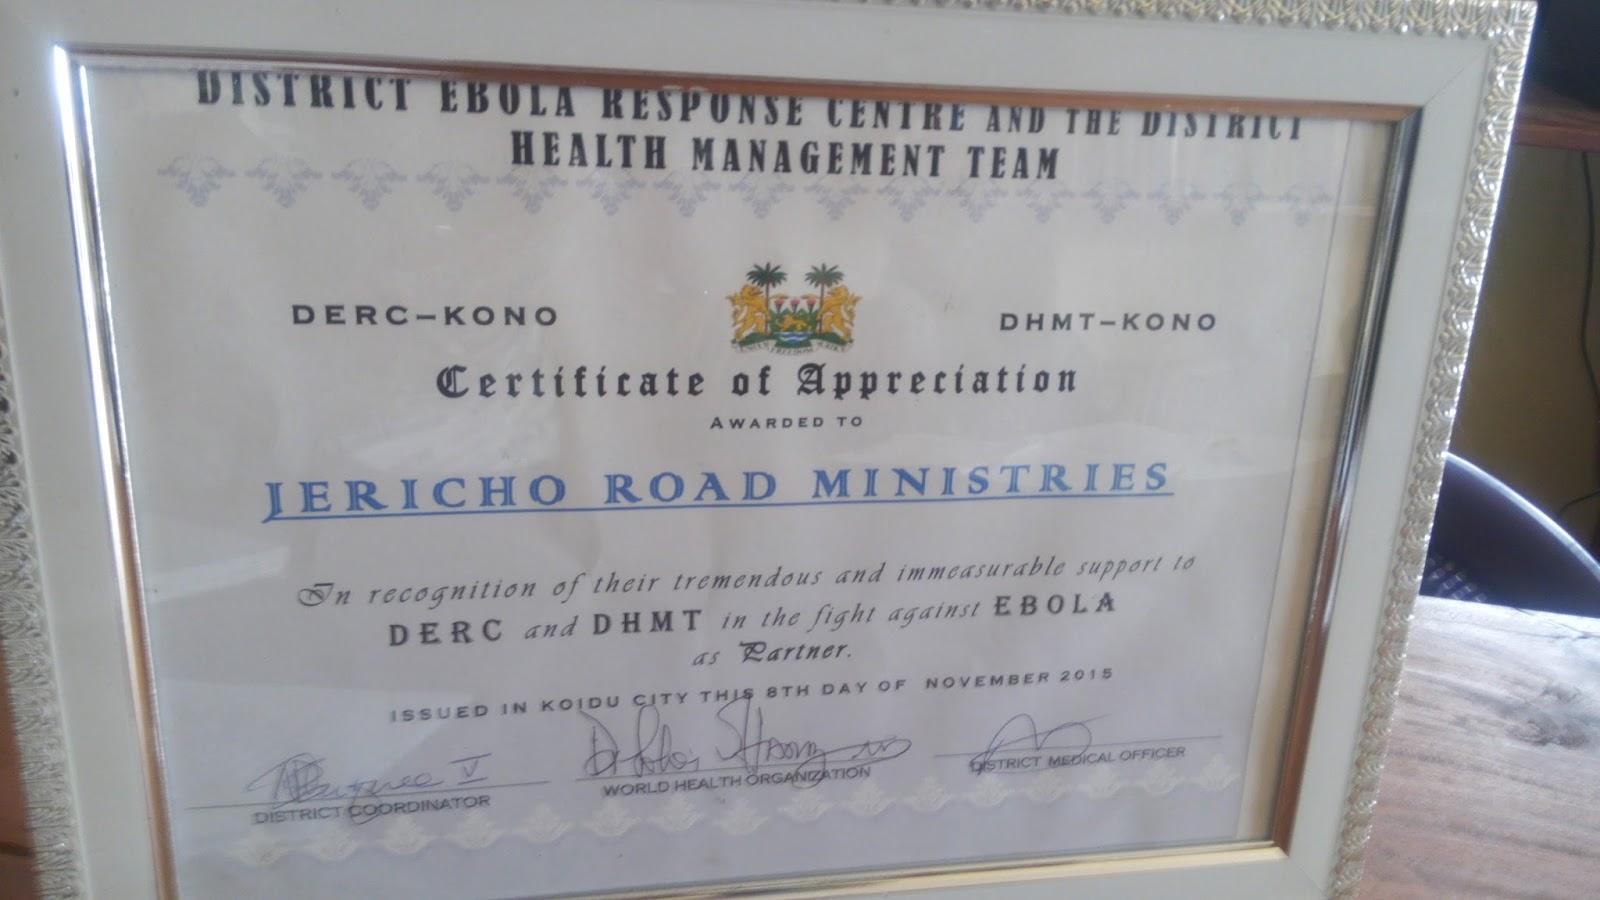 Jericho Road Global Health Outreach In Sierra Leone January 2016